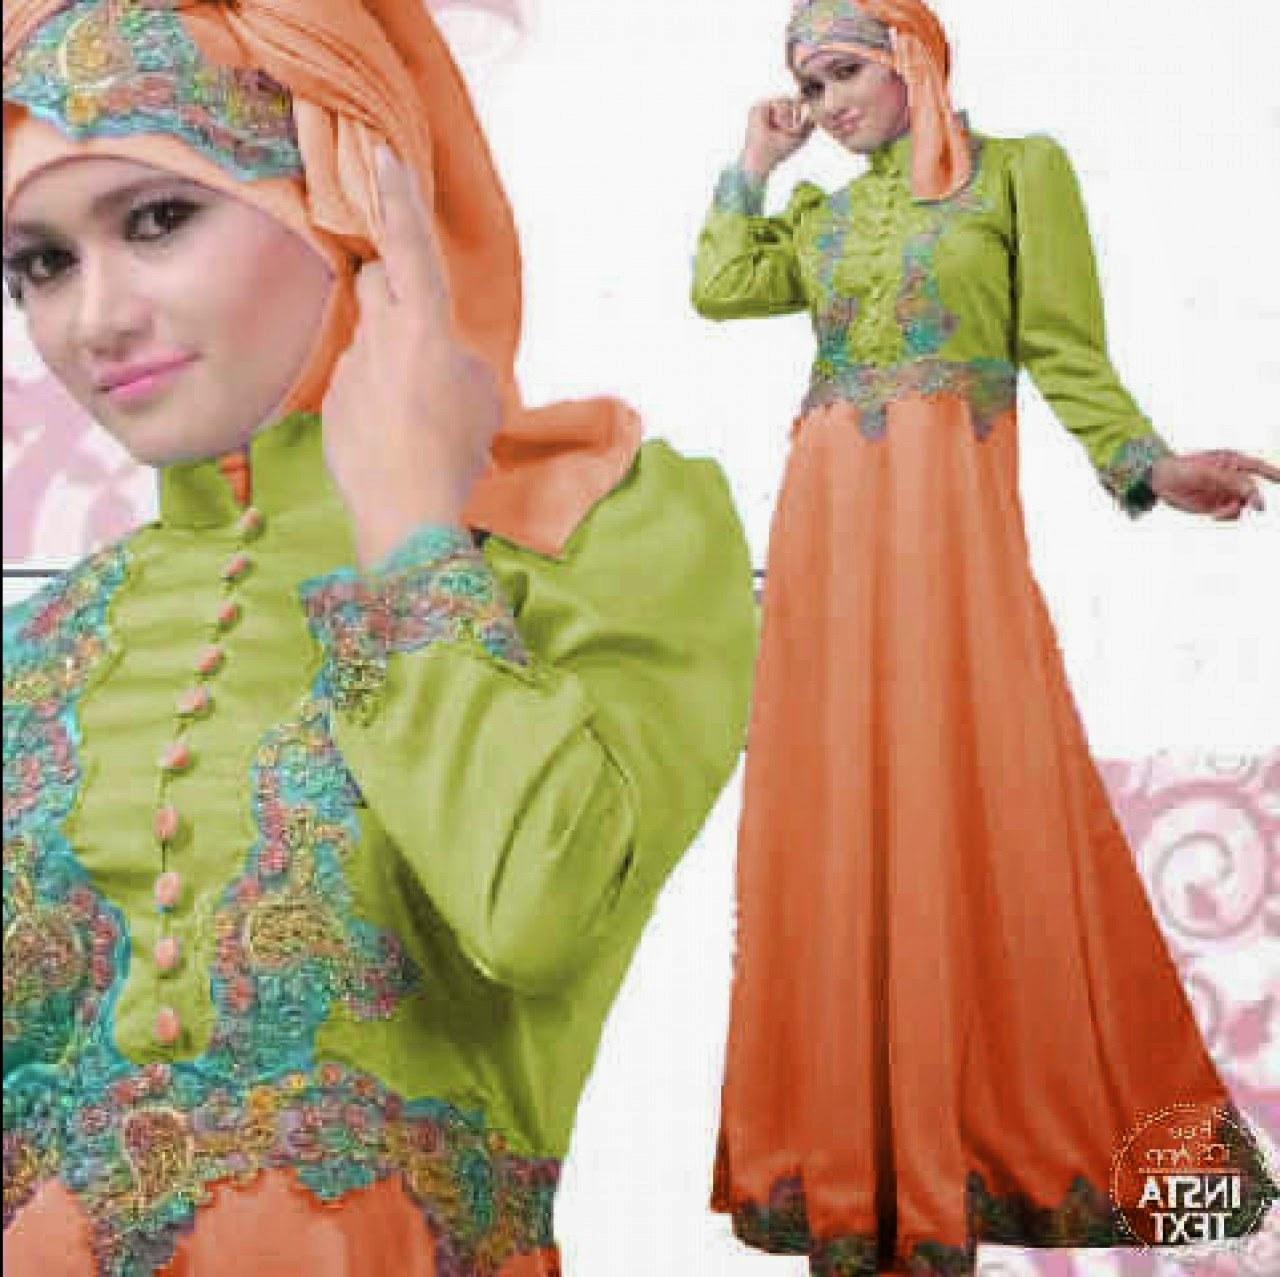 Model Gambar Model Baju Lebaran Bqdd Kumpulan Foto Model Baju Kebaya Lebaran Terbaru 2018